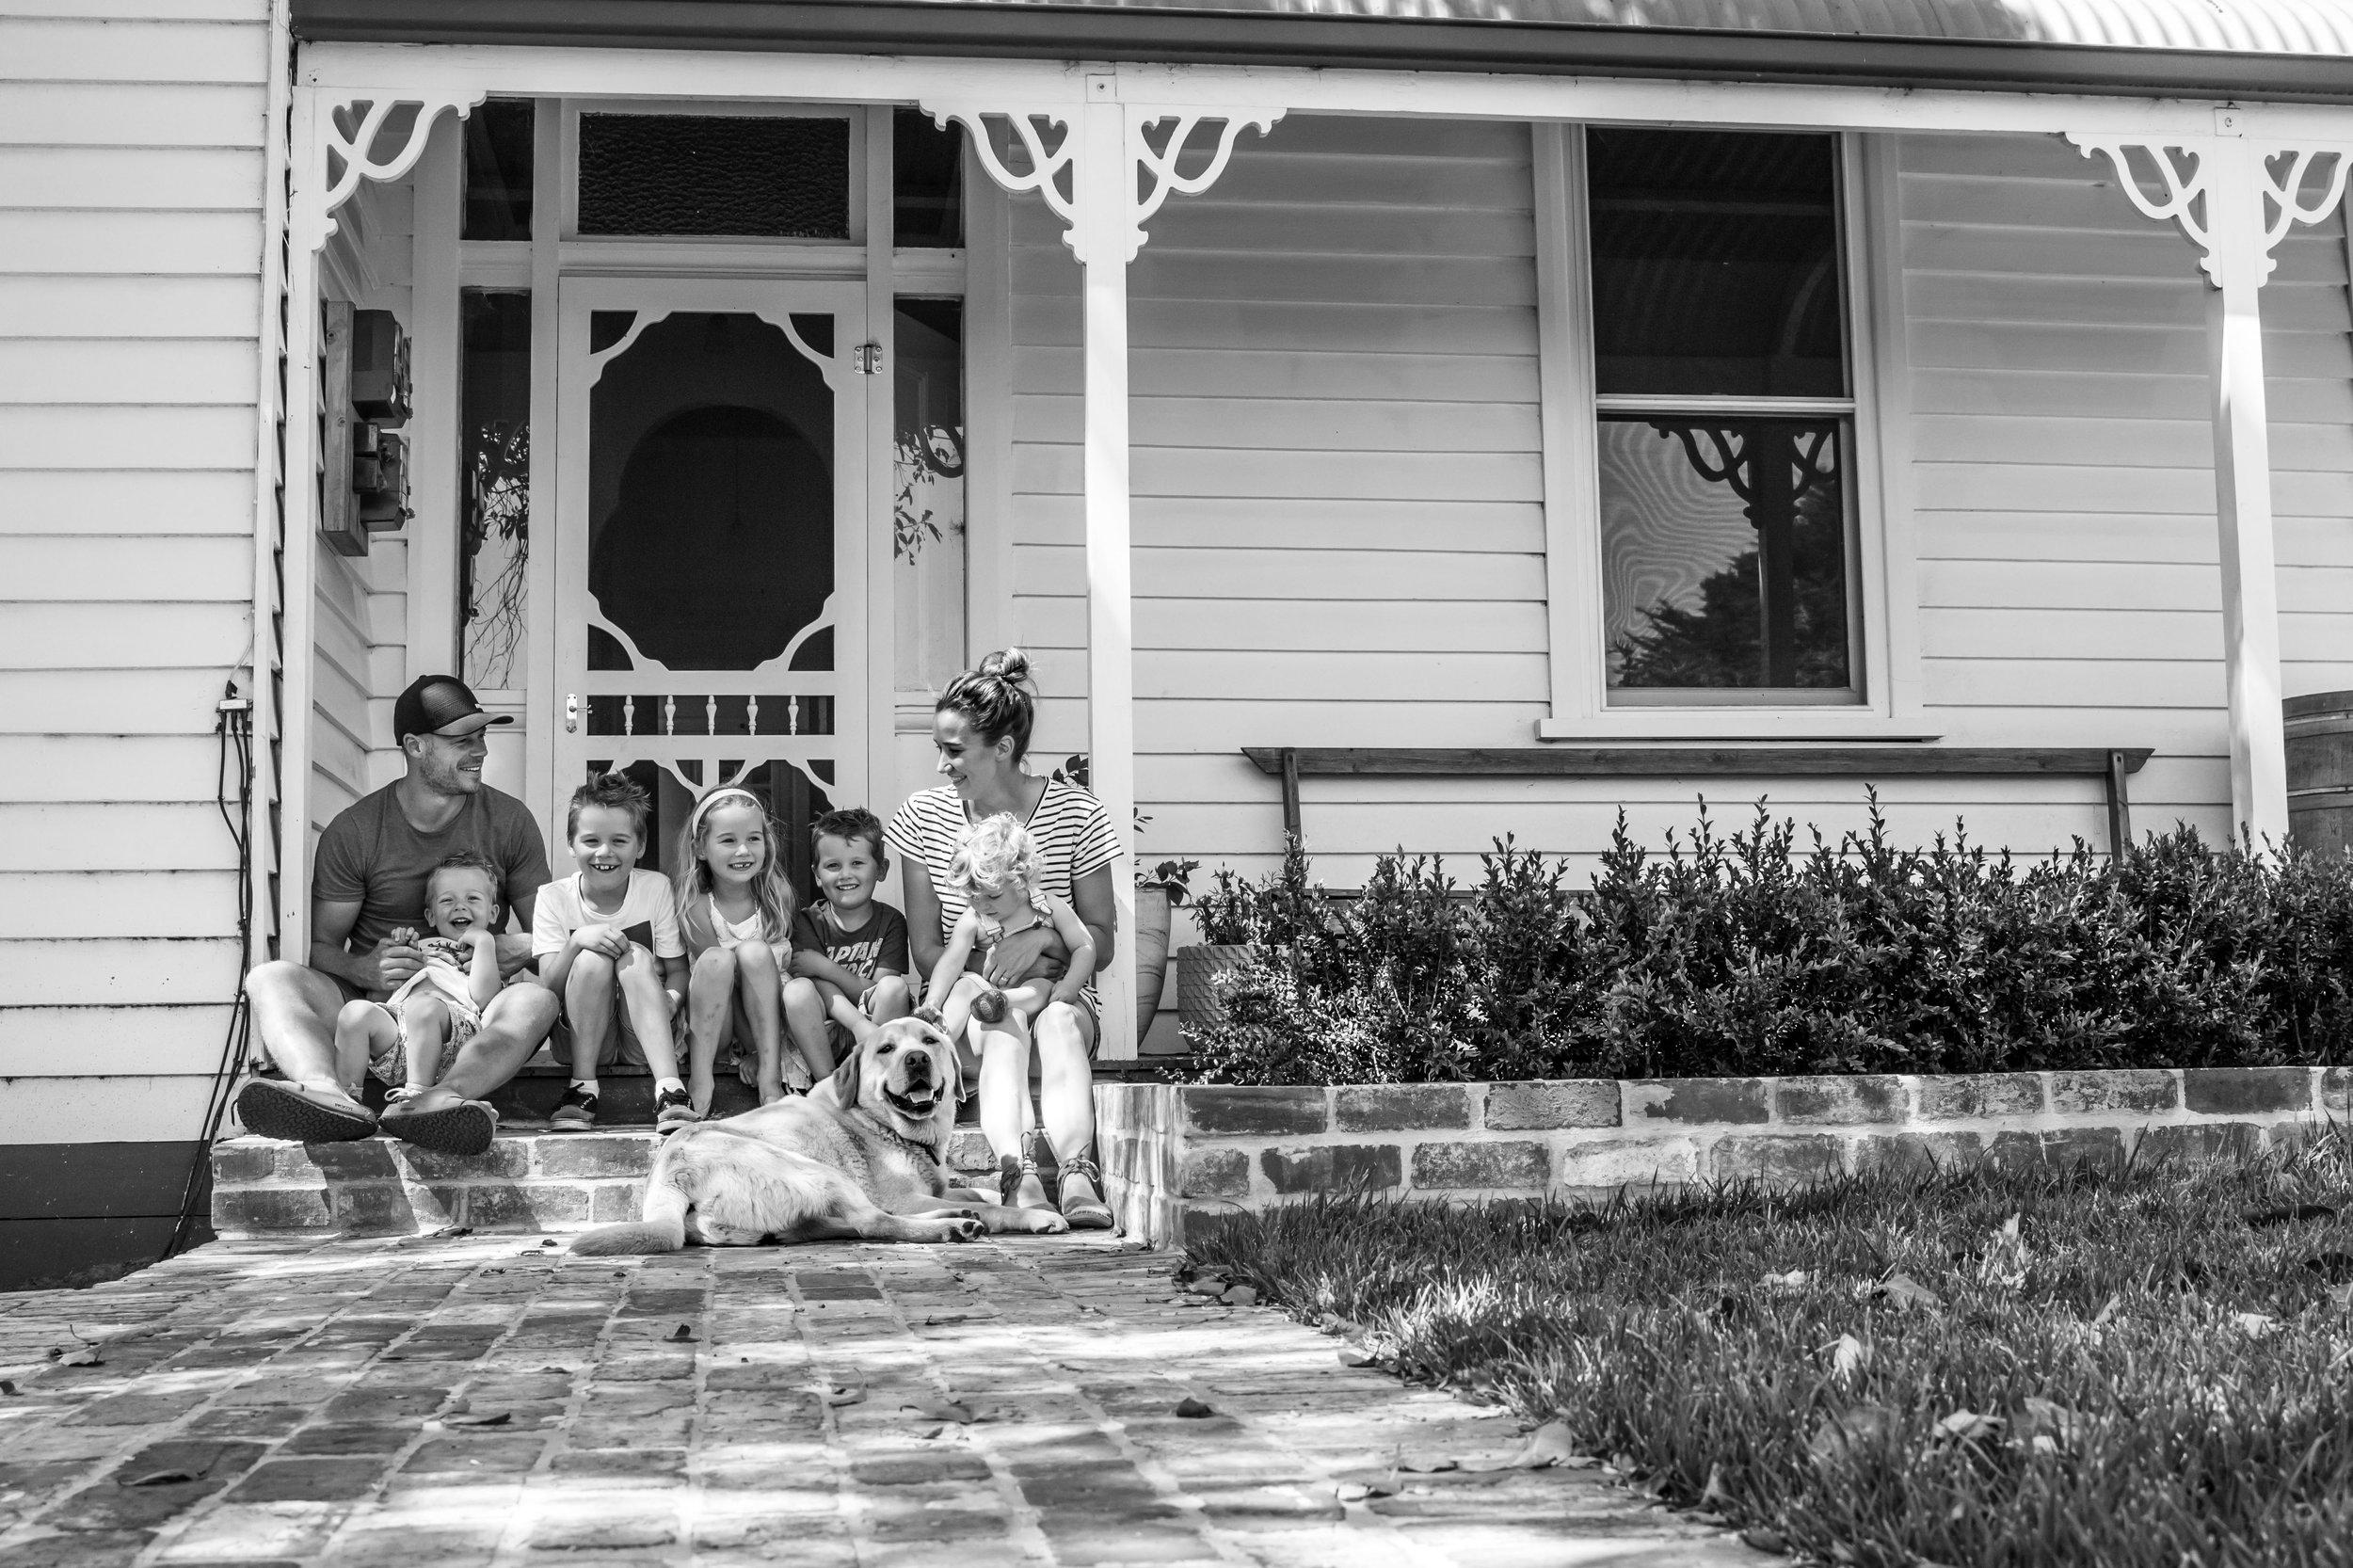 Lauren McAdam Photography geelong torquay newtown jan juc family in home photographer homestead-4-.jpg